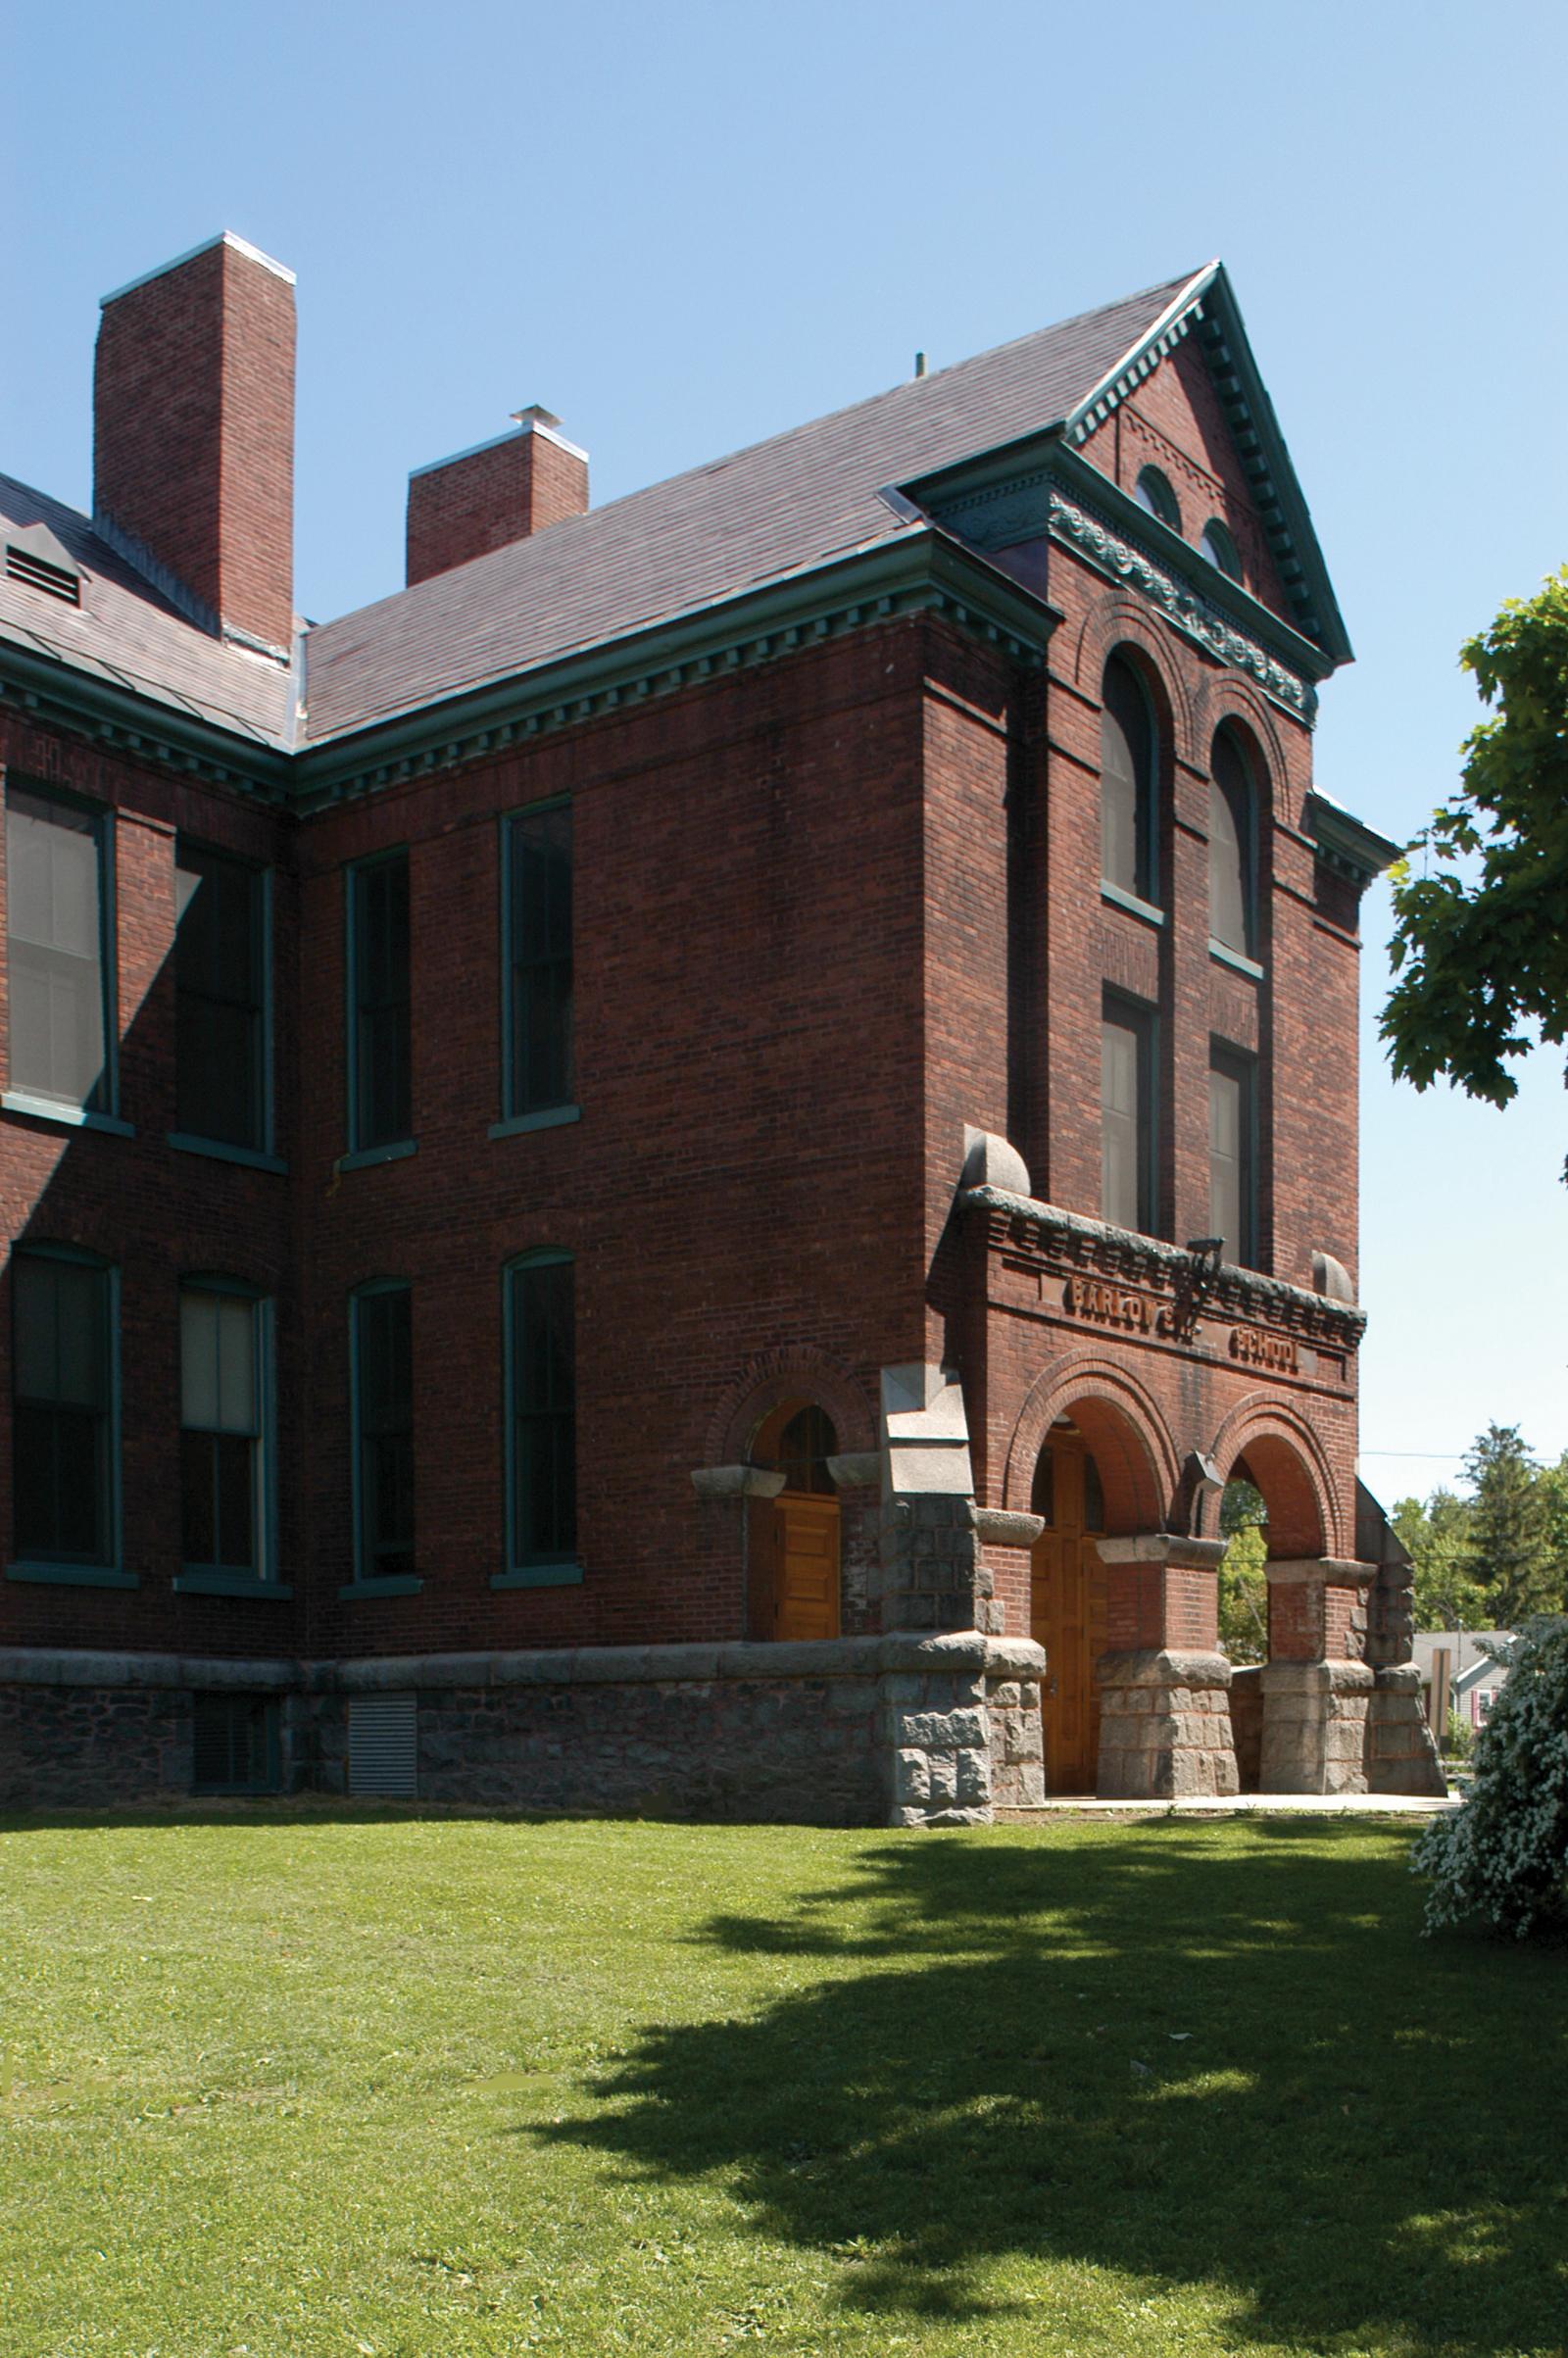 St. Albans Barlow Street School